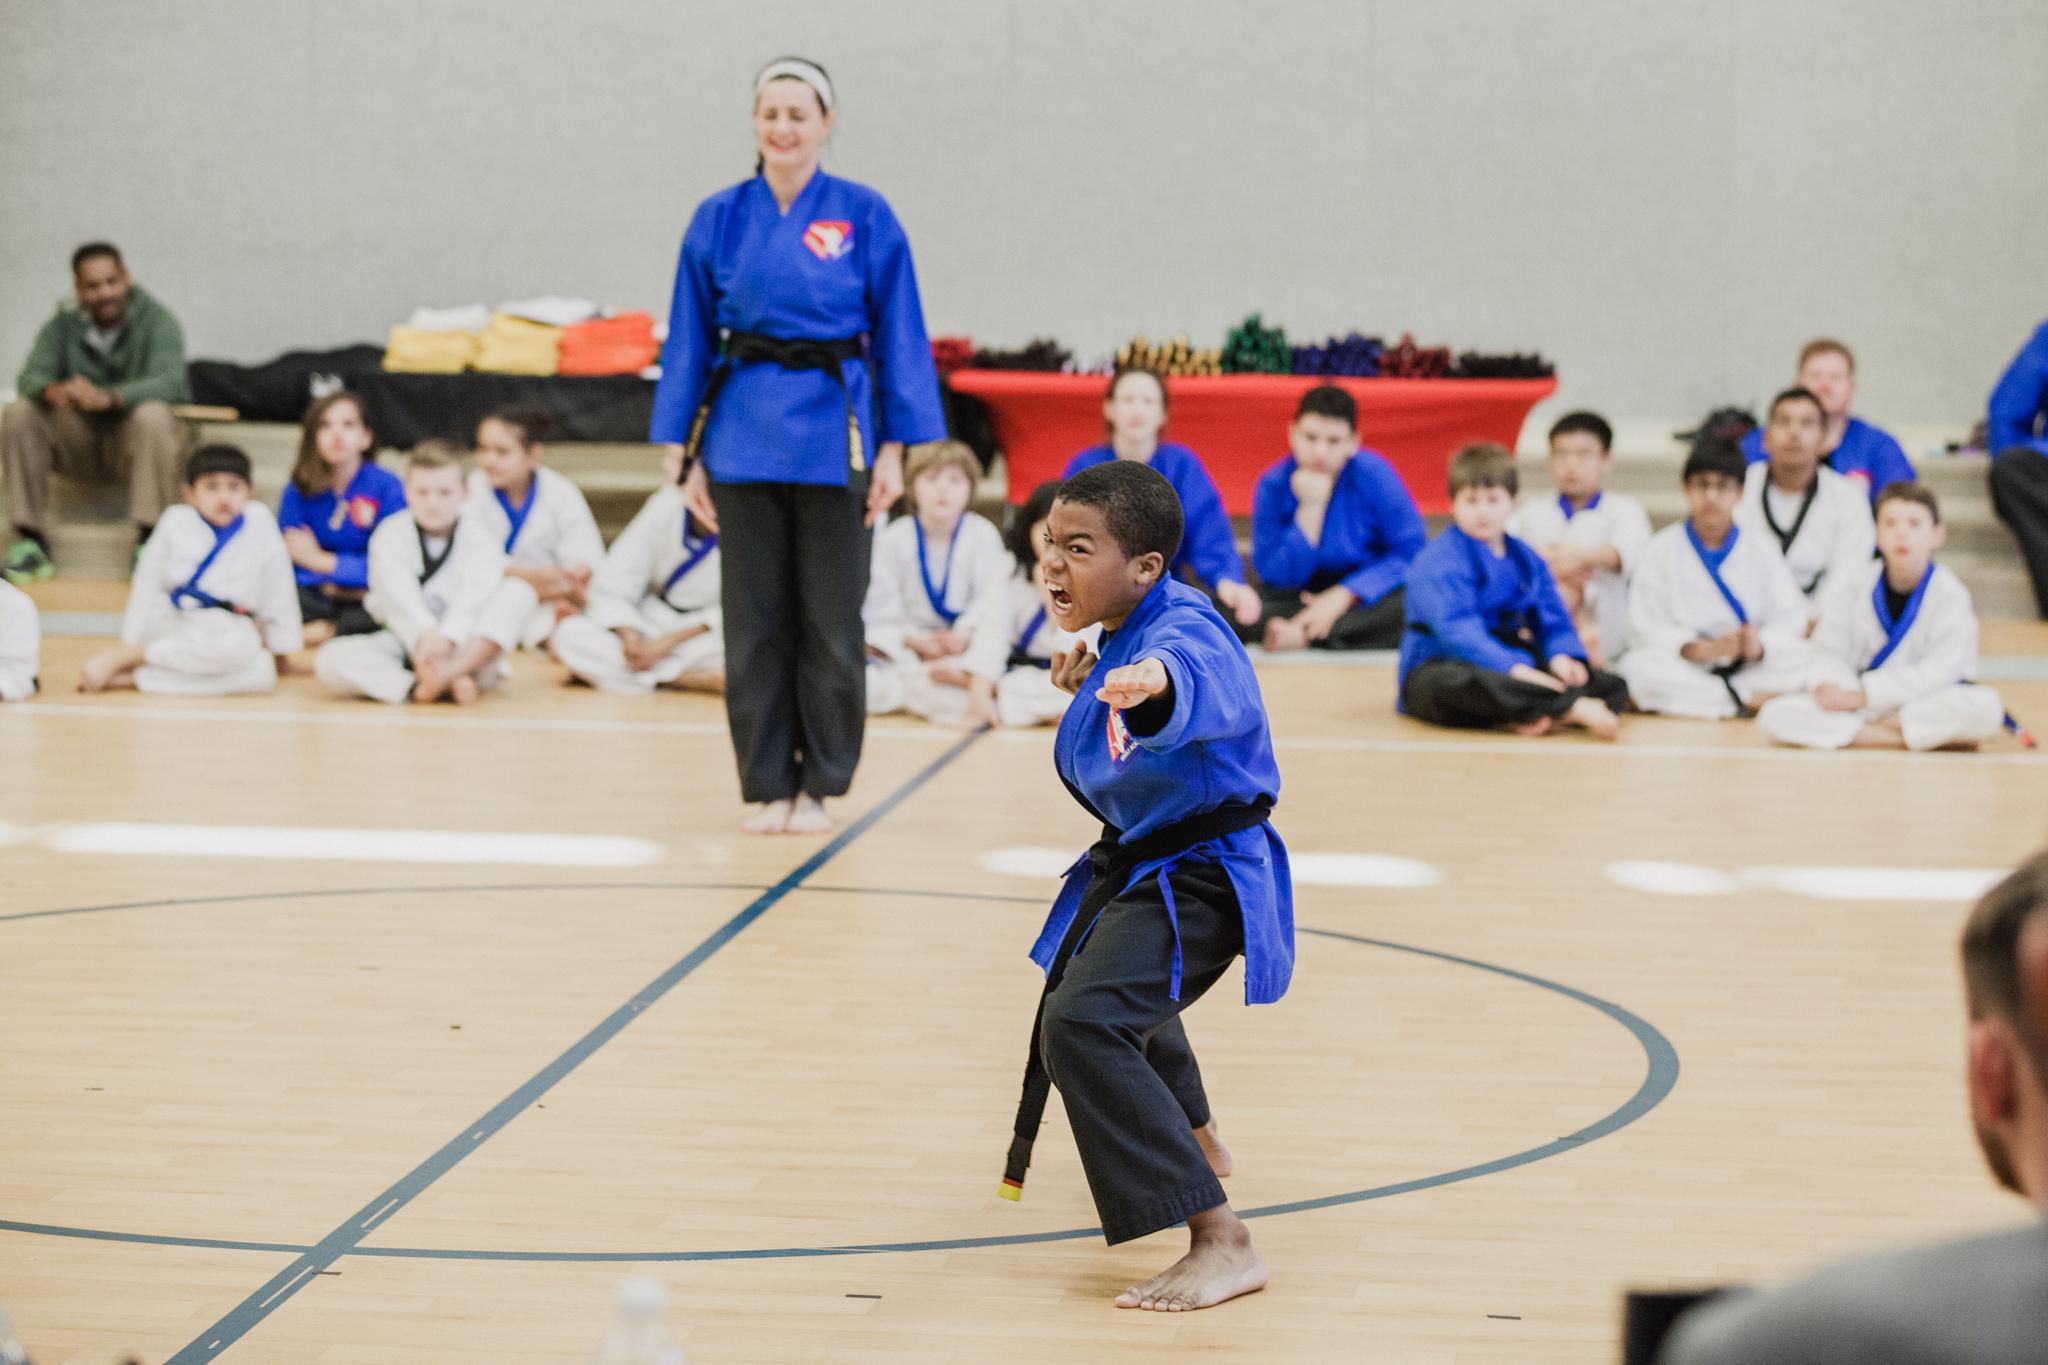 martial arts uplevel indian land children